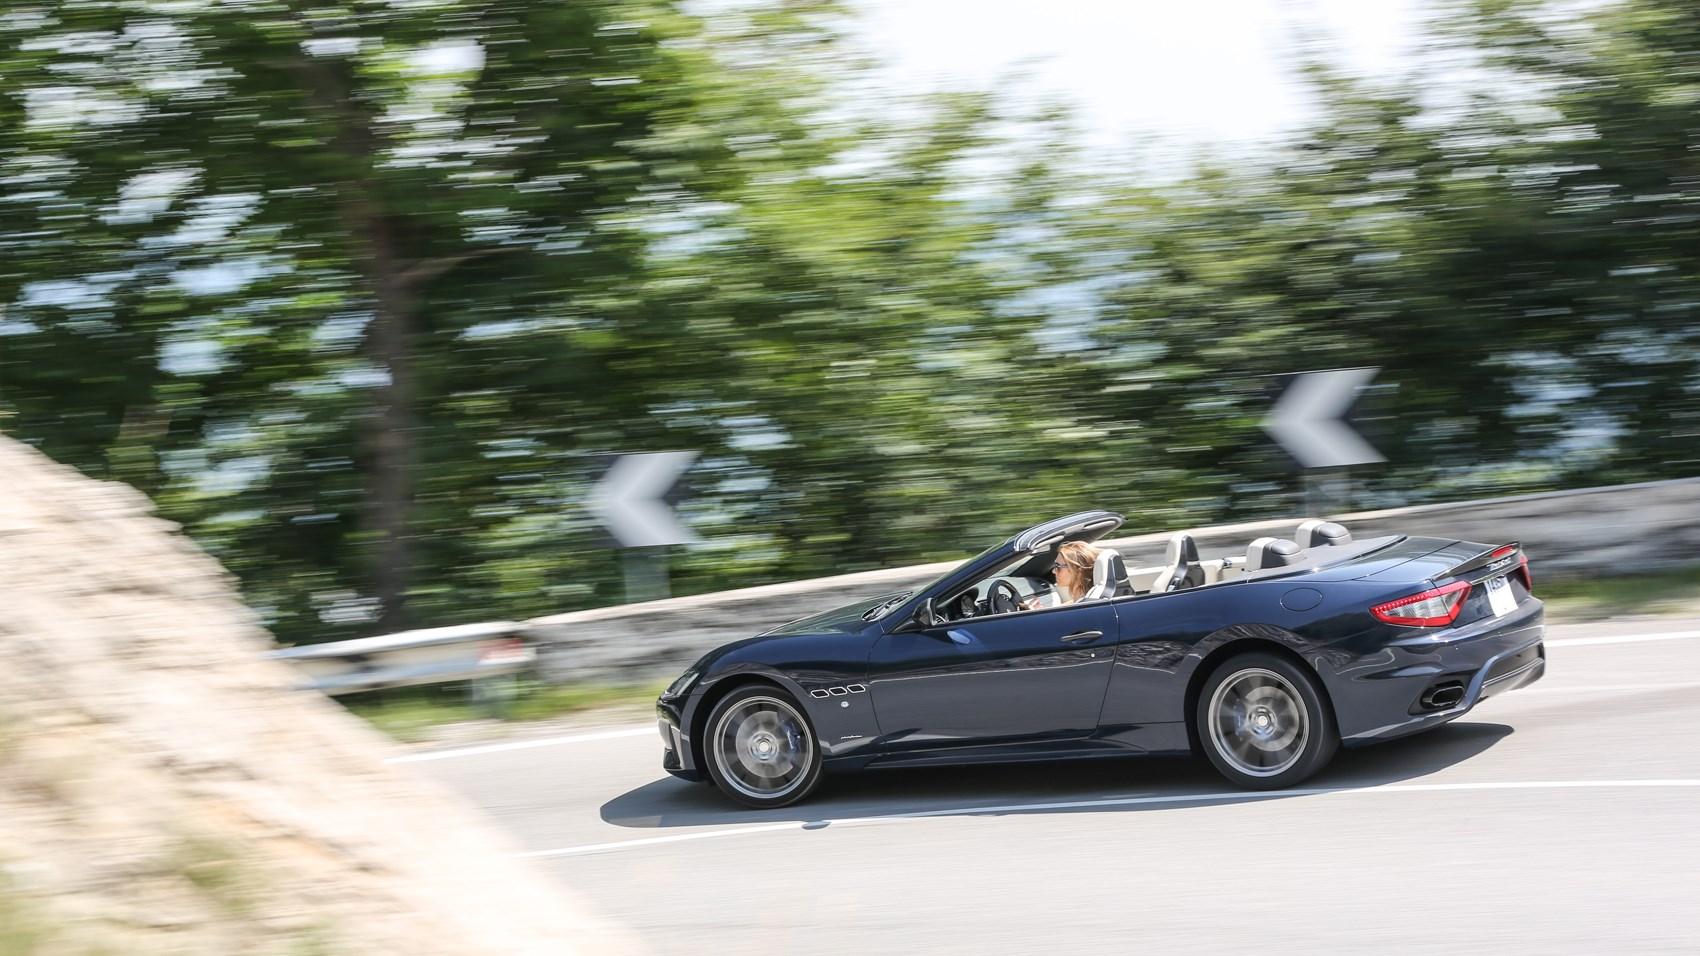 Maserati GranCabrio side panning